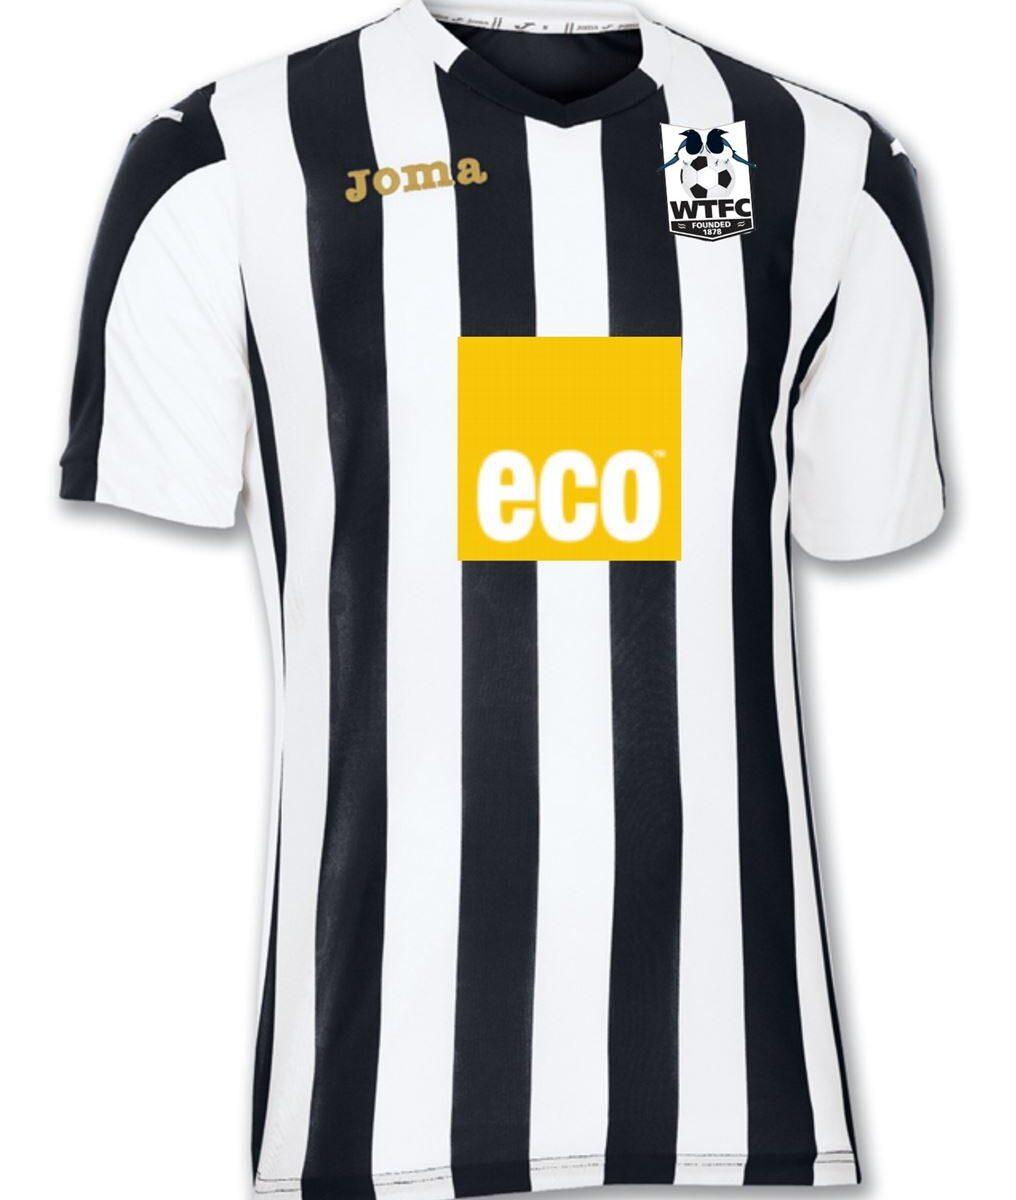 Wimborne Town FC Replica Shirt